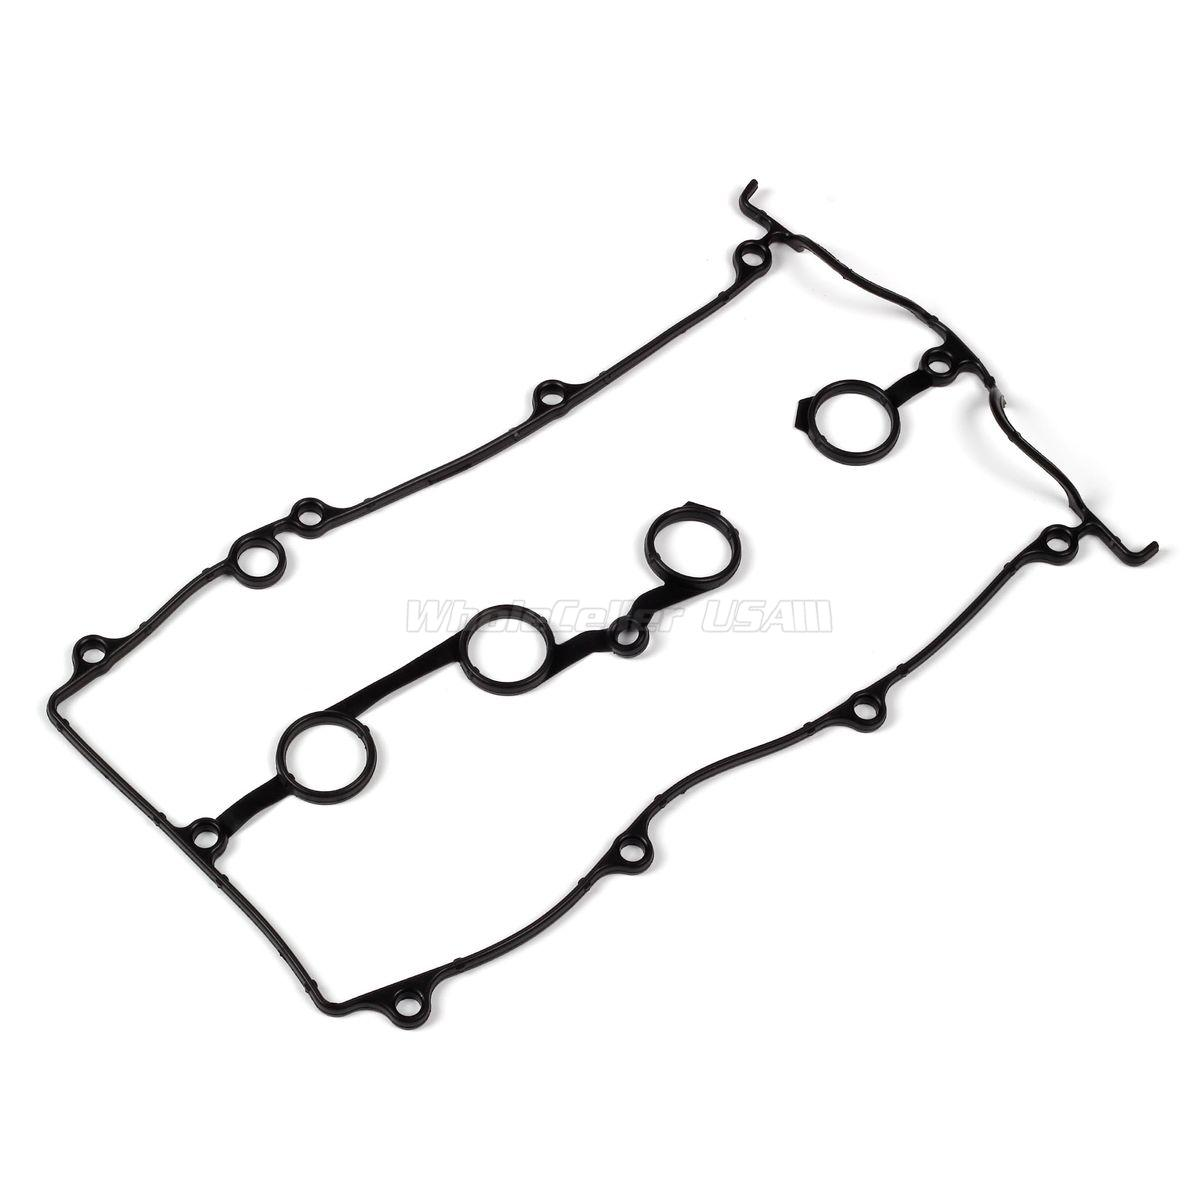 For Mazda Protege 626 01 03 Valve Cover Gasket 2 0l Dohc